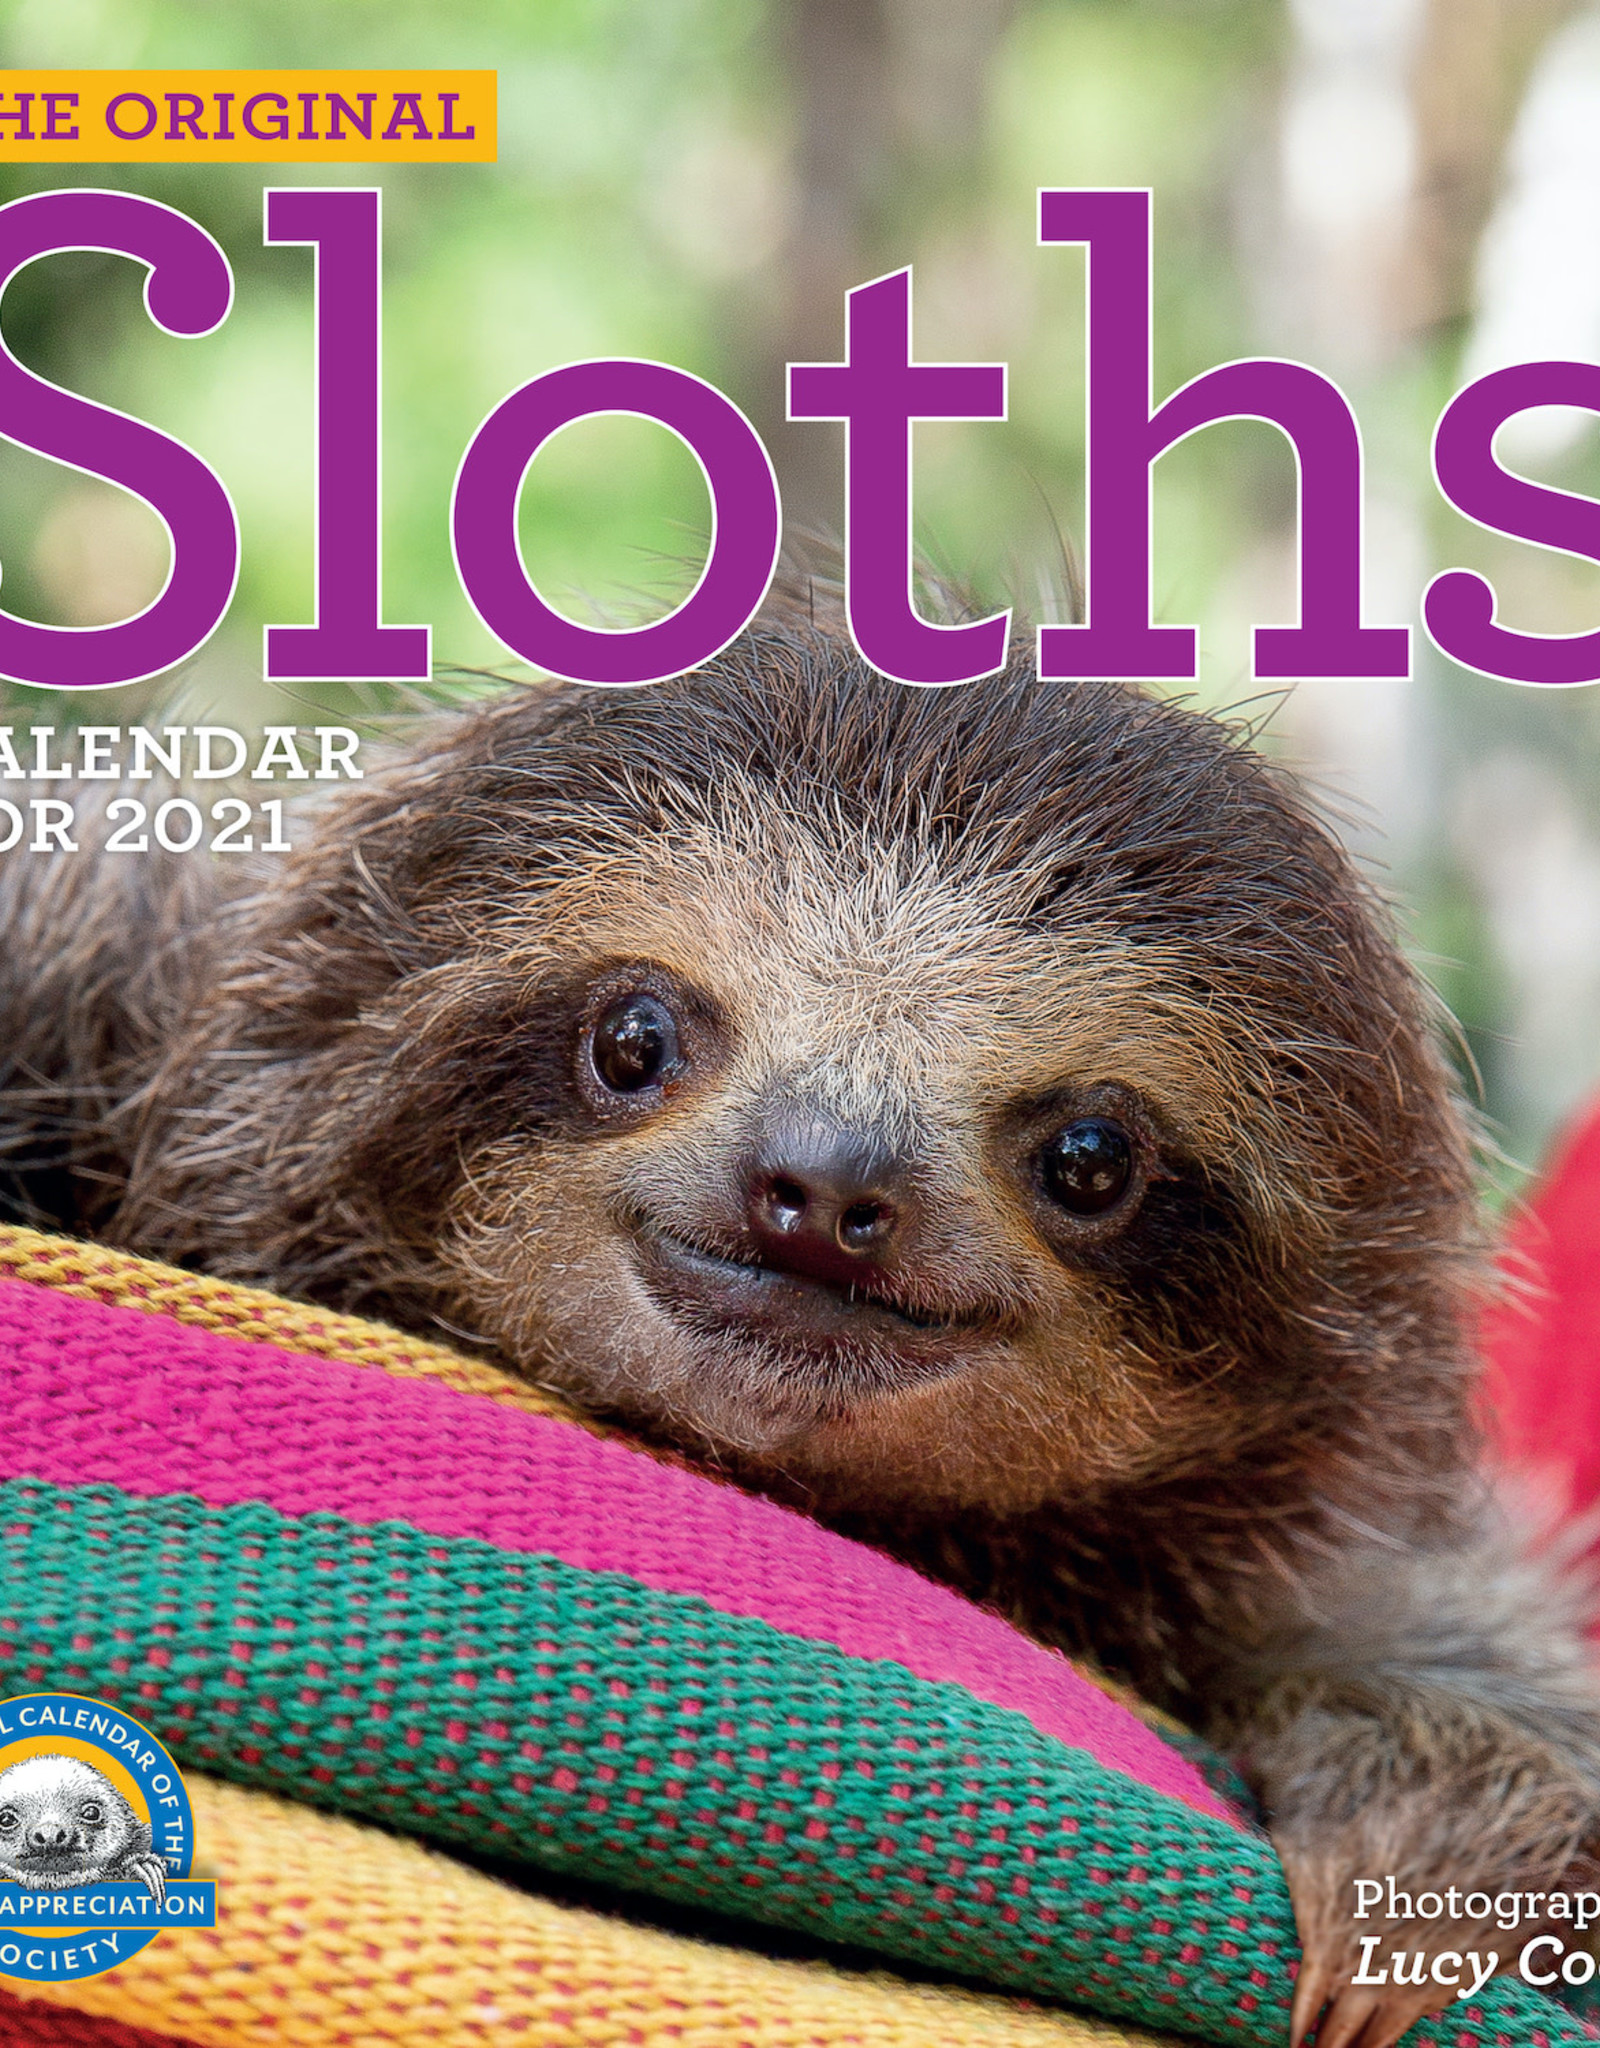 2021 Wall Calendar: Sloths